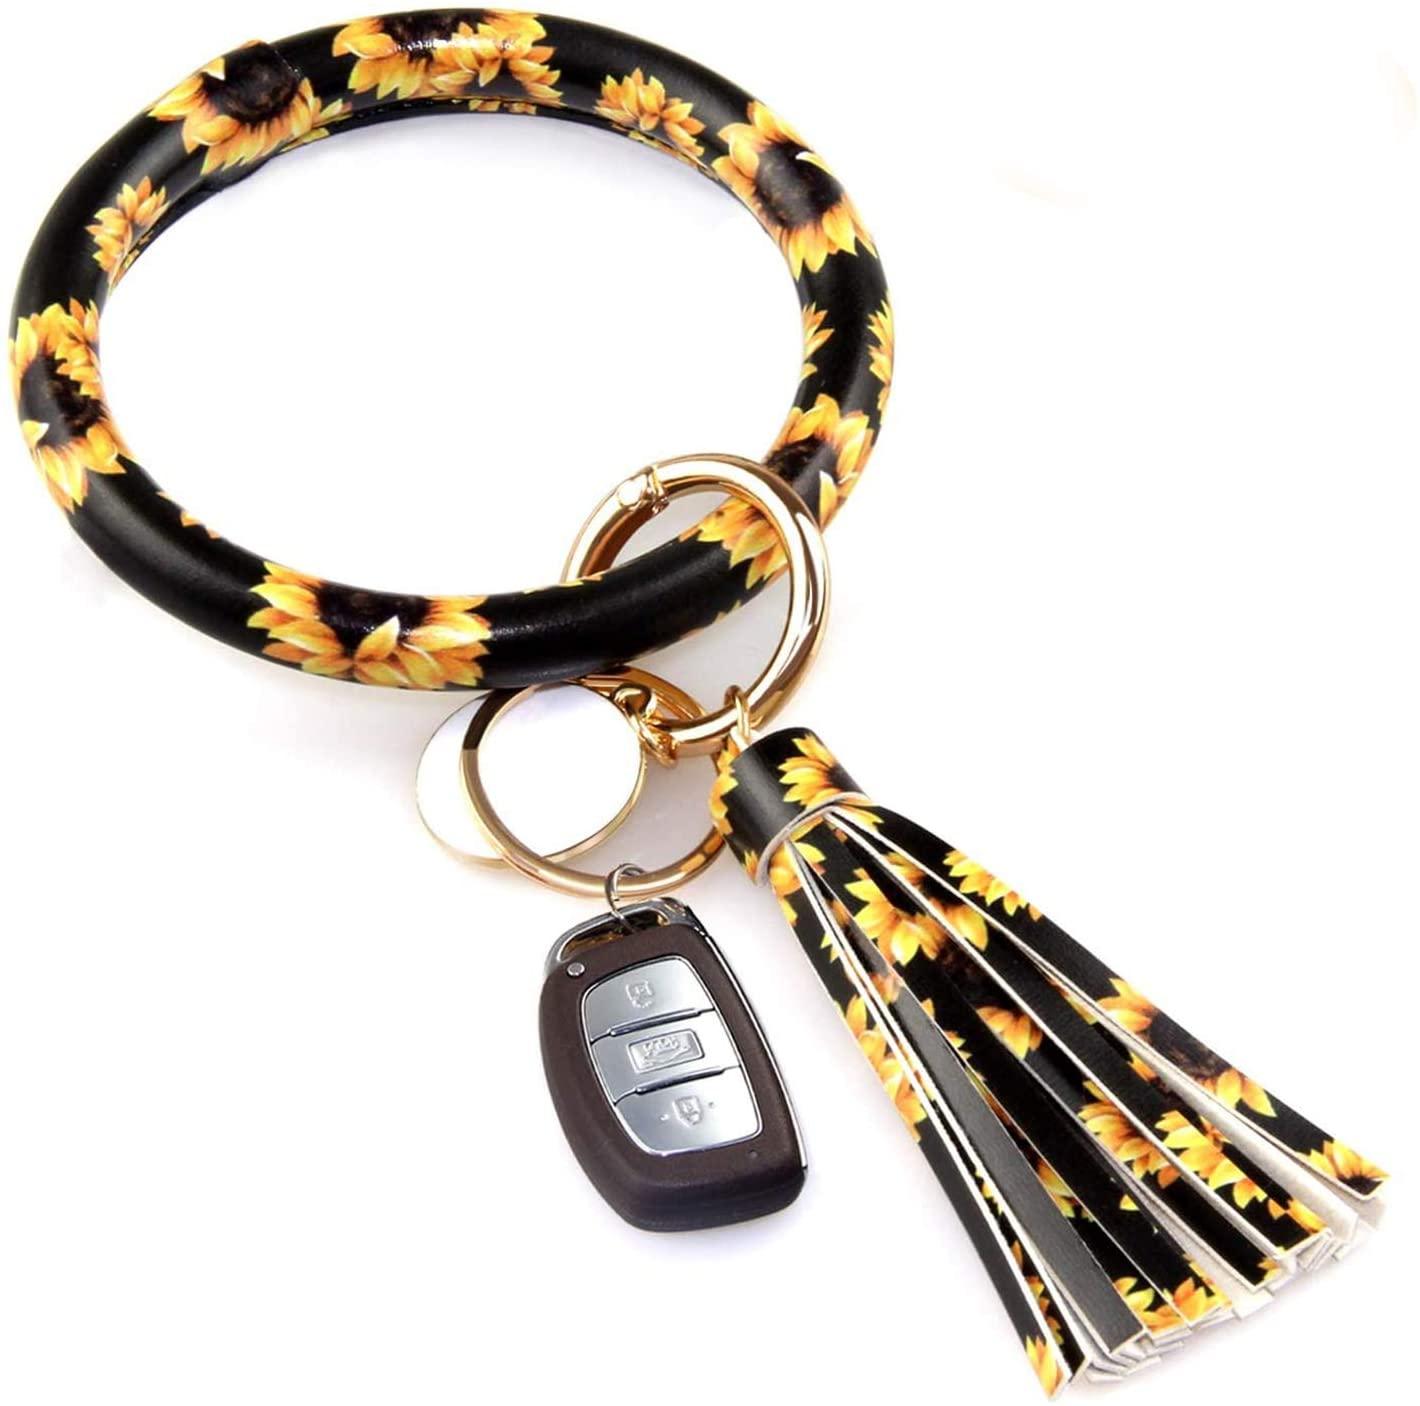 Keychain Bracelet, Leather Wristlet Keyring Bangle Bracelet with Tassel, Oversize Round Key Chain Wrist Bracelet for Women Girls, Perfect for Birthday, Valentine's Day Gift